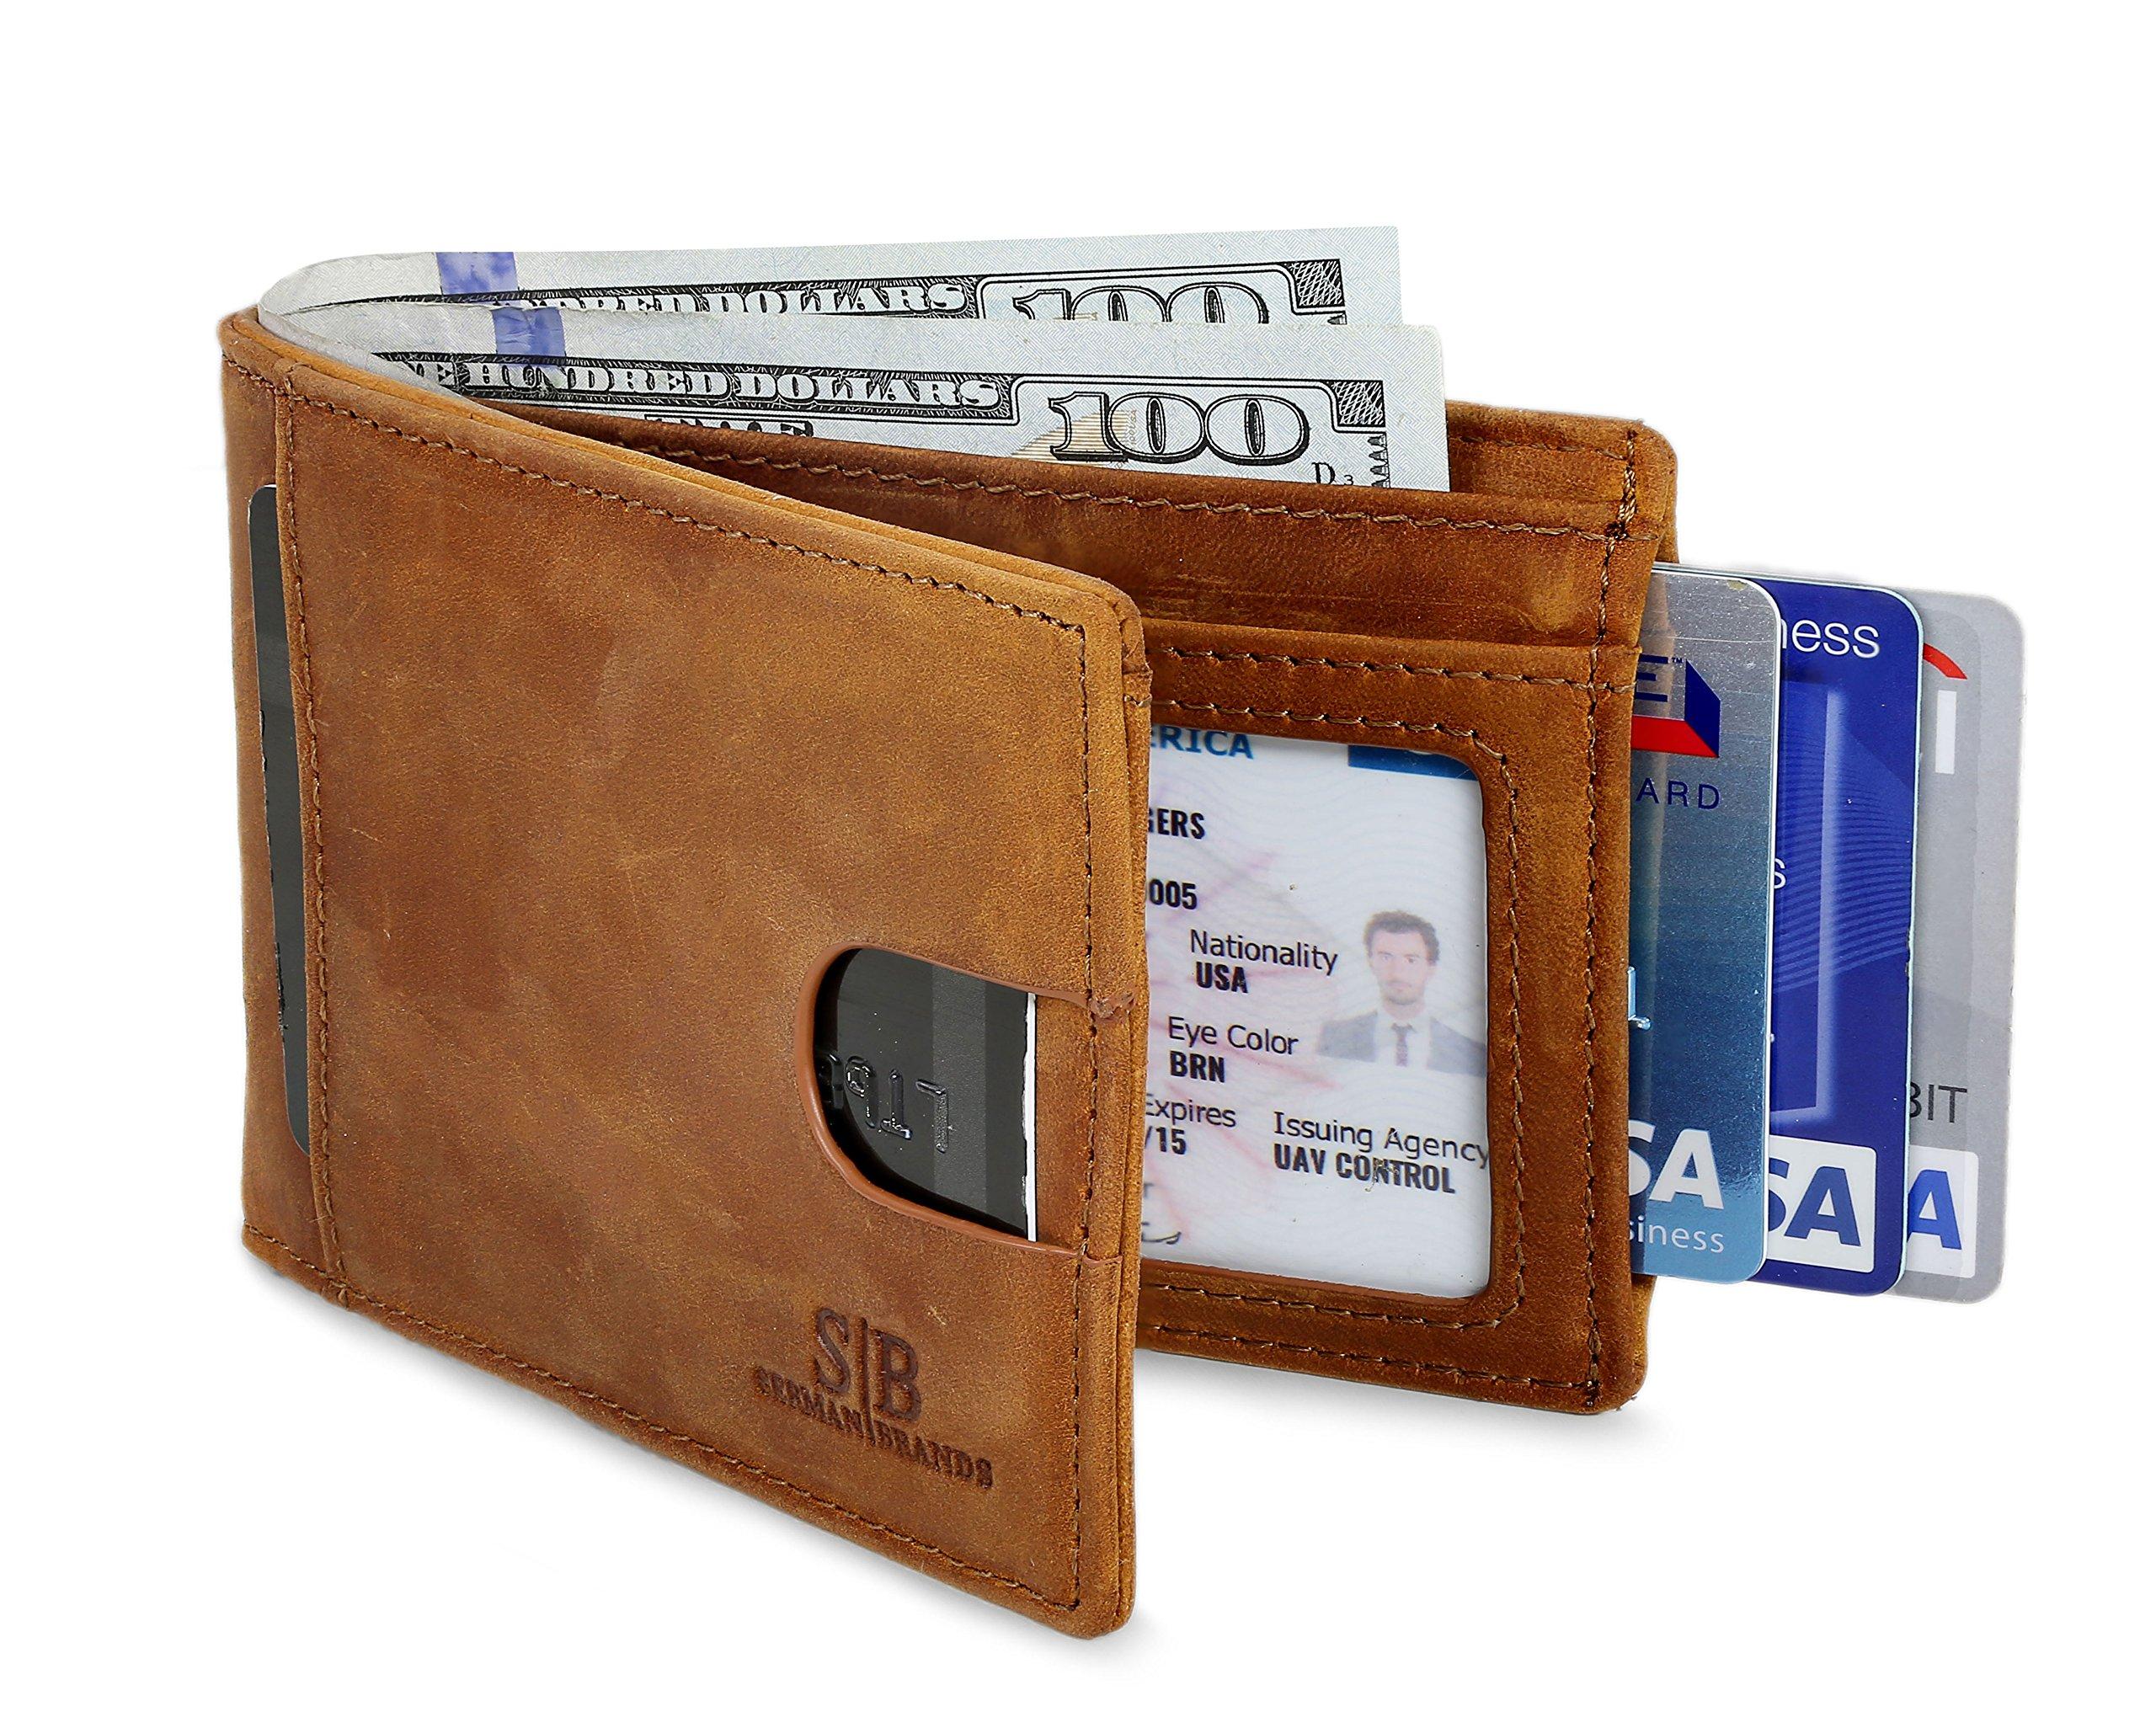 Travel Wallet RFID Blocking Bifold Slim Genuine Leather Thin Minimalist Front Pocket Wallet men Thin Billfold Slim wallets for men Made From Full Grain Leather (California Desert 2.0)